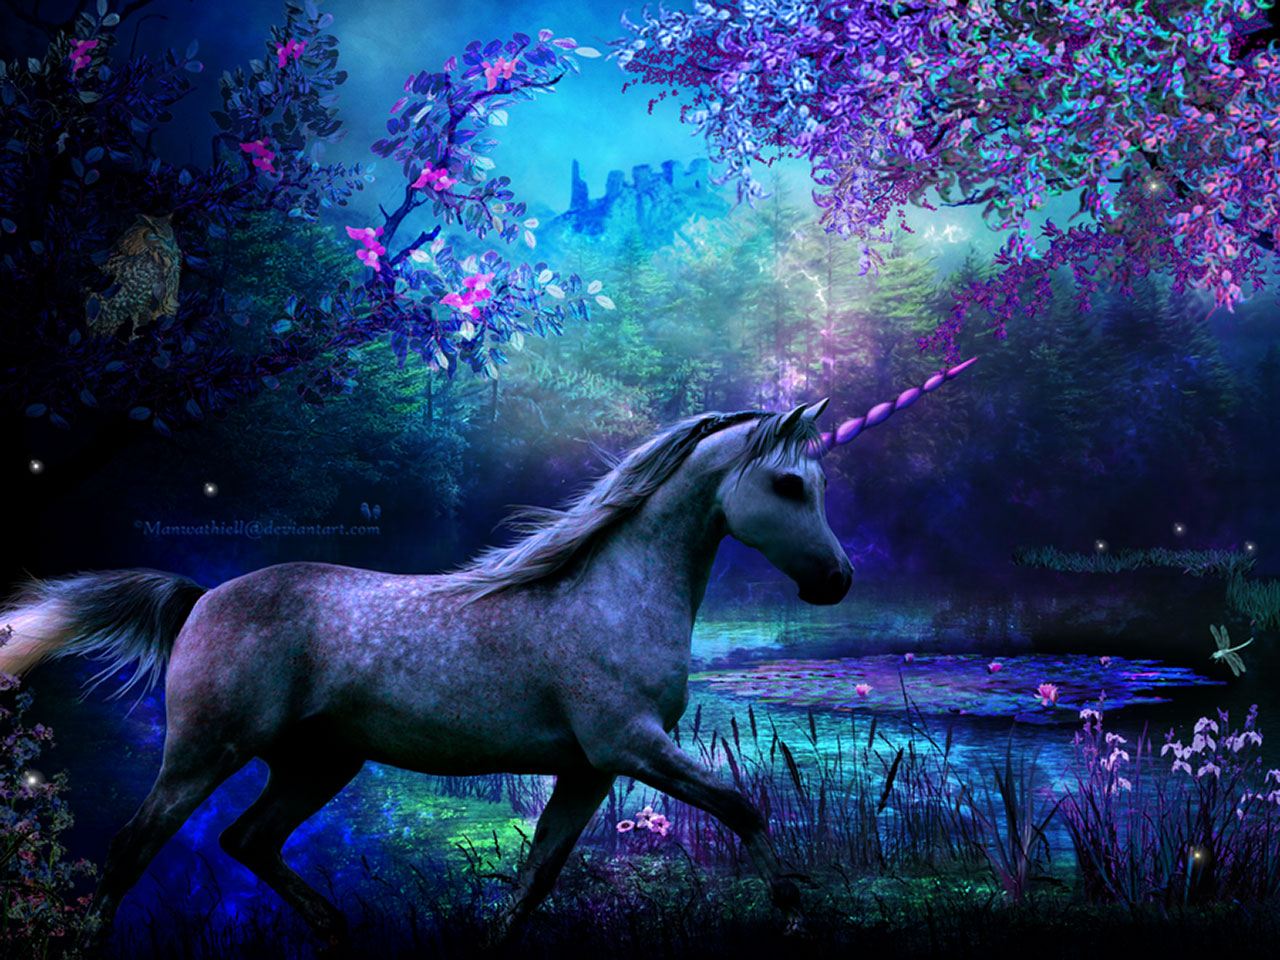 unicorn Computer Wallpapers Desktop Backgrounds 1280x960 ID 1280x960